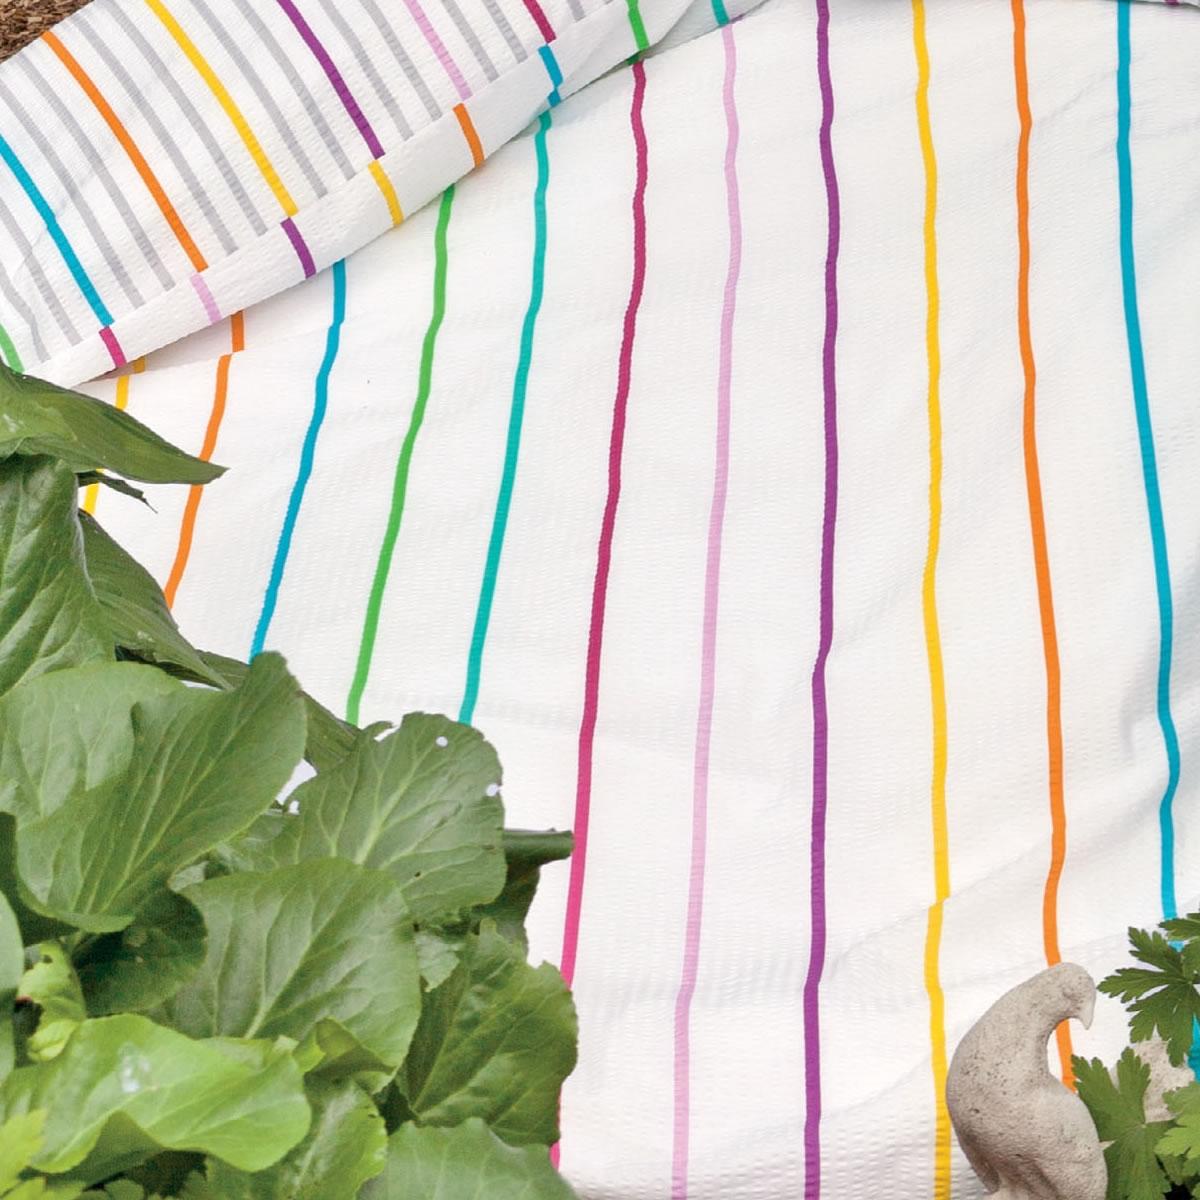 janine mako soft seersucker wende bettw sche tango 200x200 cm 2425 09. Black Bedroom Furniture Sets. Home Design Ideas